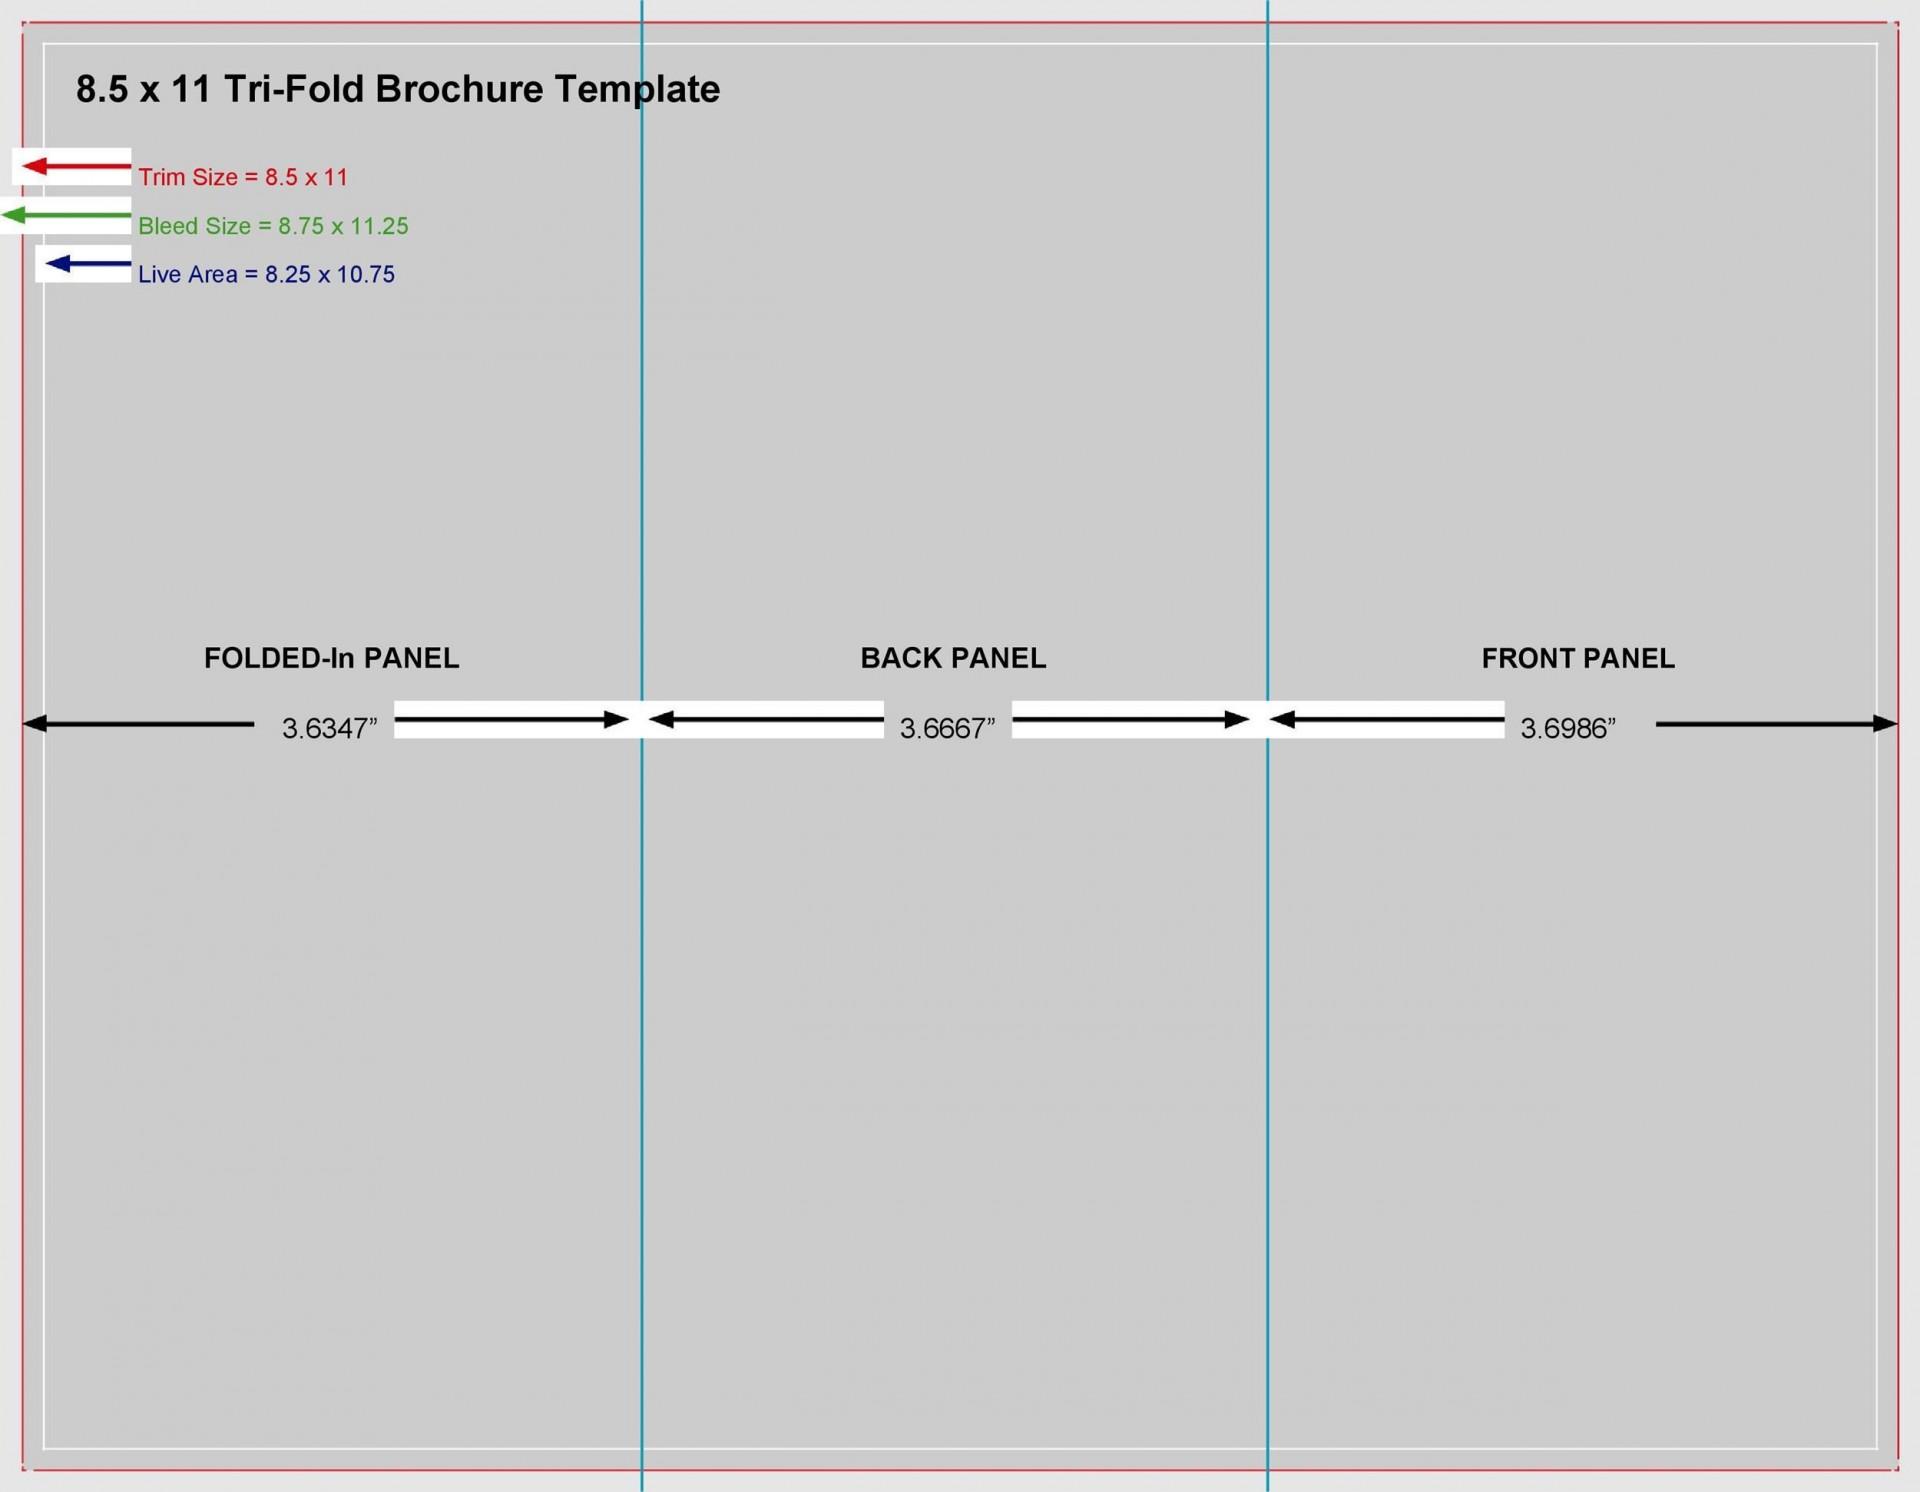 008 Unique Brochure Template For Google Doc High Definition  Docs Free 3 Panel Tri Fold1920